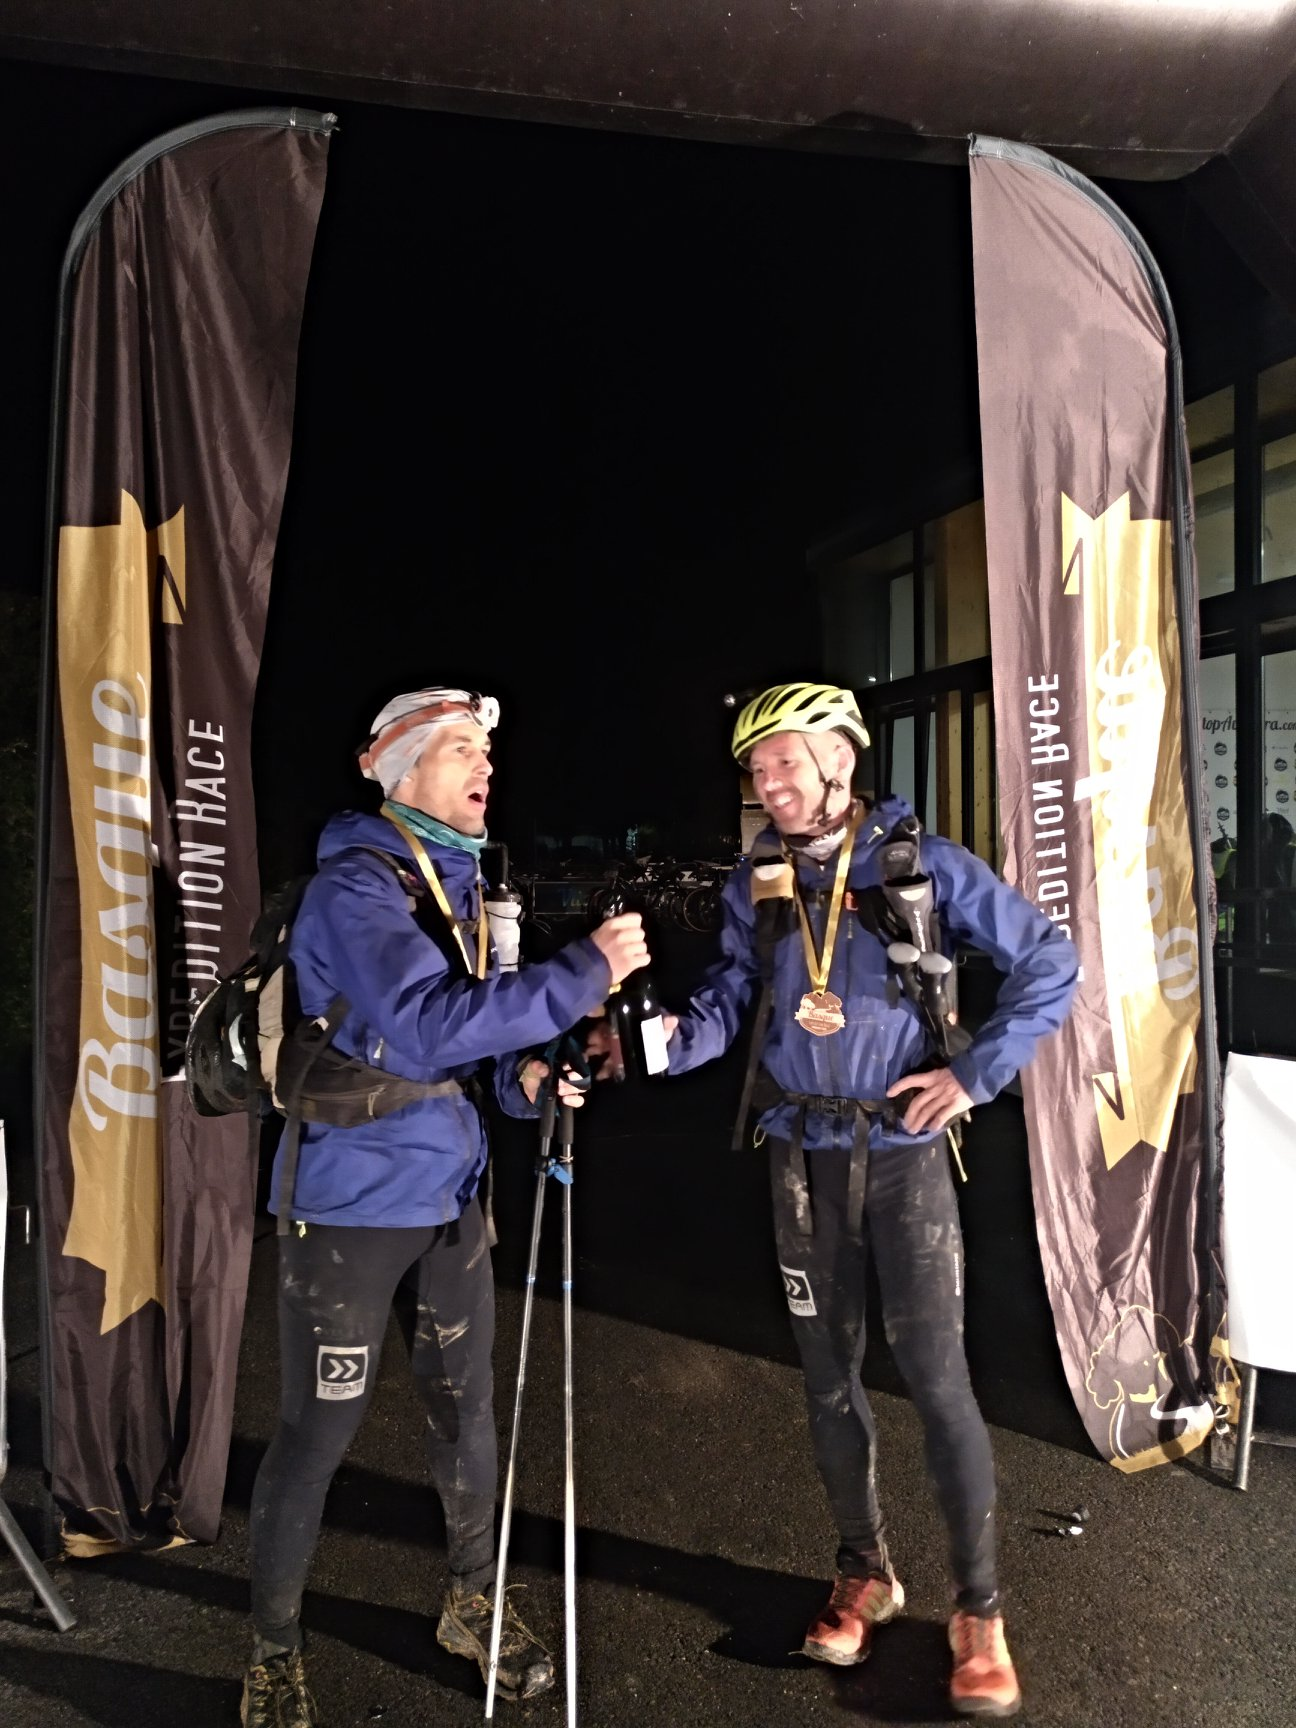 Winners Adventure/Pairs category